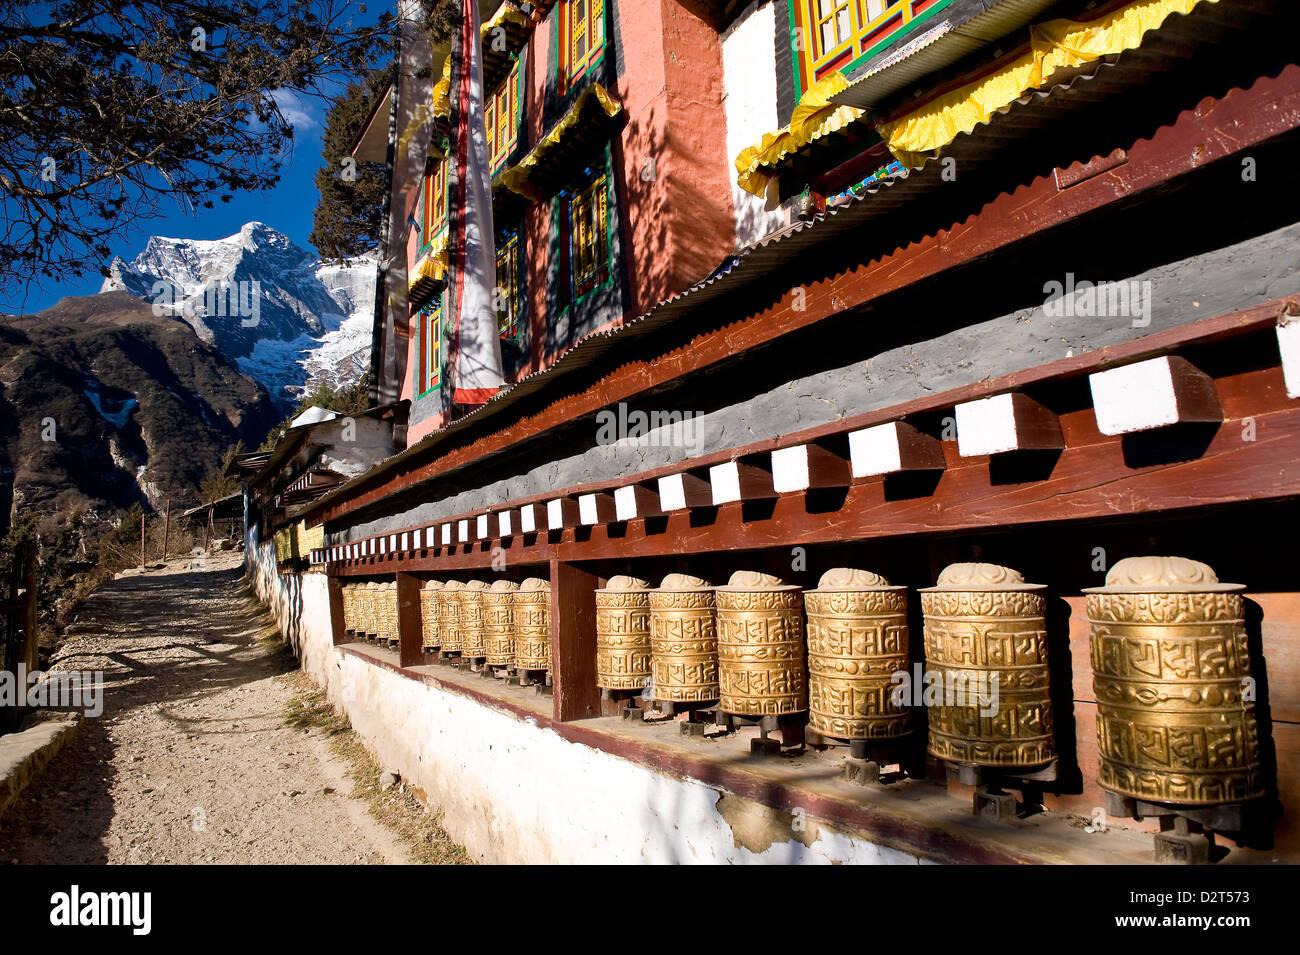 Namche Gompa (Monastery), Namche Bazaar, Solu Khumbu Region, Nepal, Himalayas, Asia - Stock Image